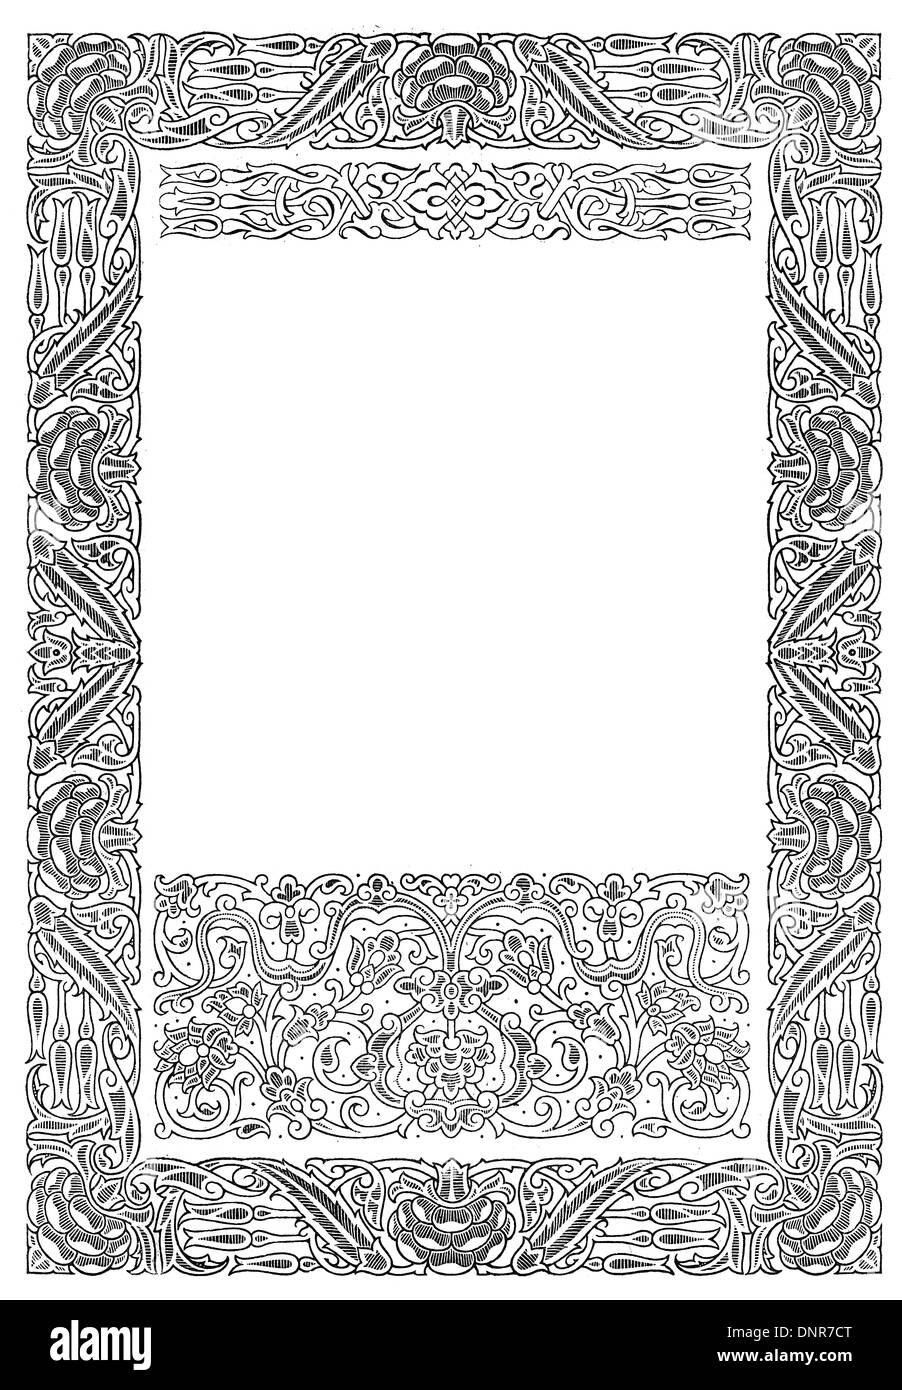 Arabesque ornate border - Stock Image